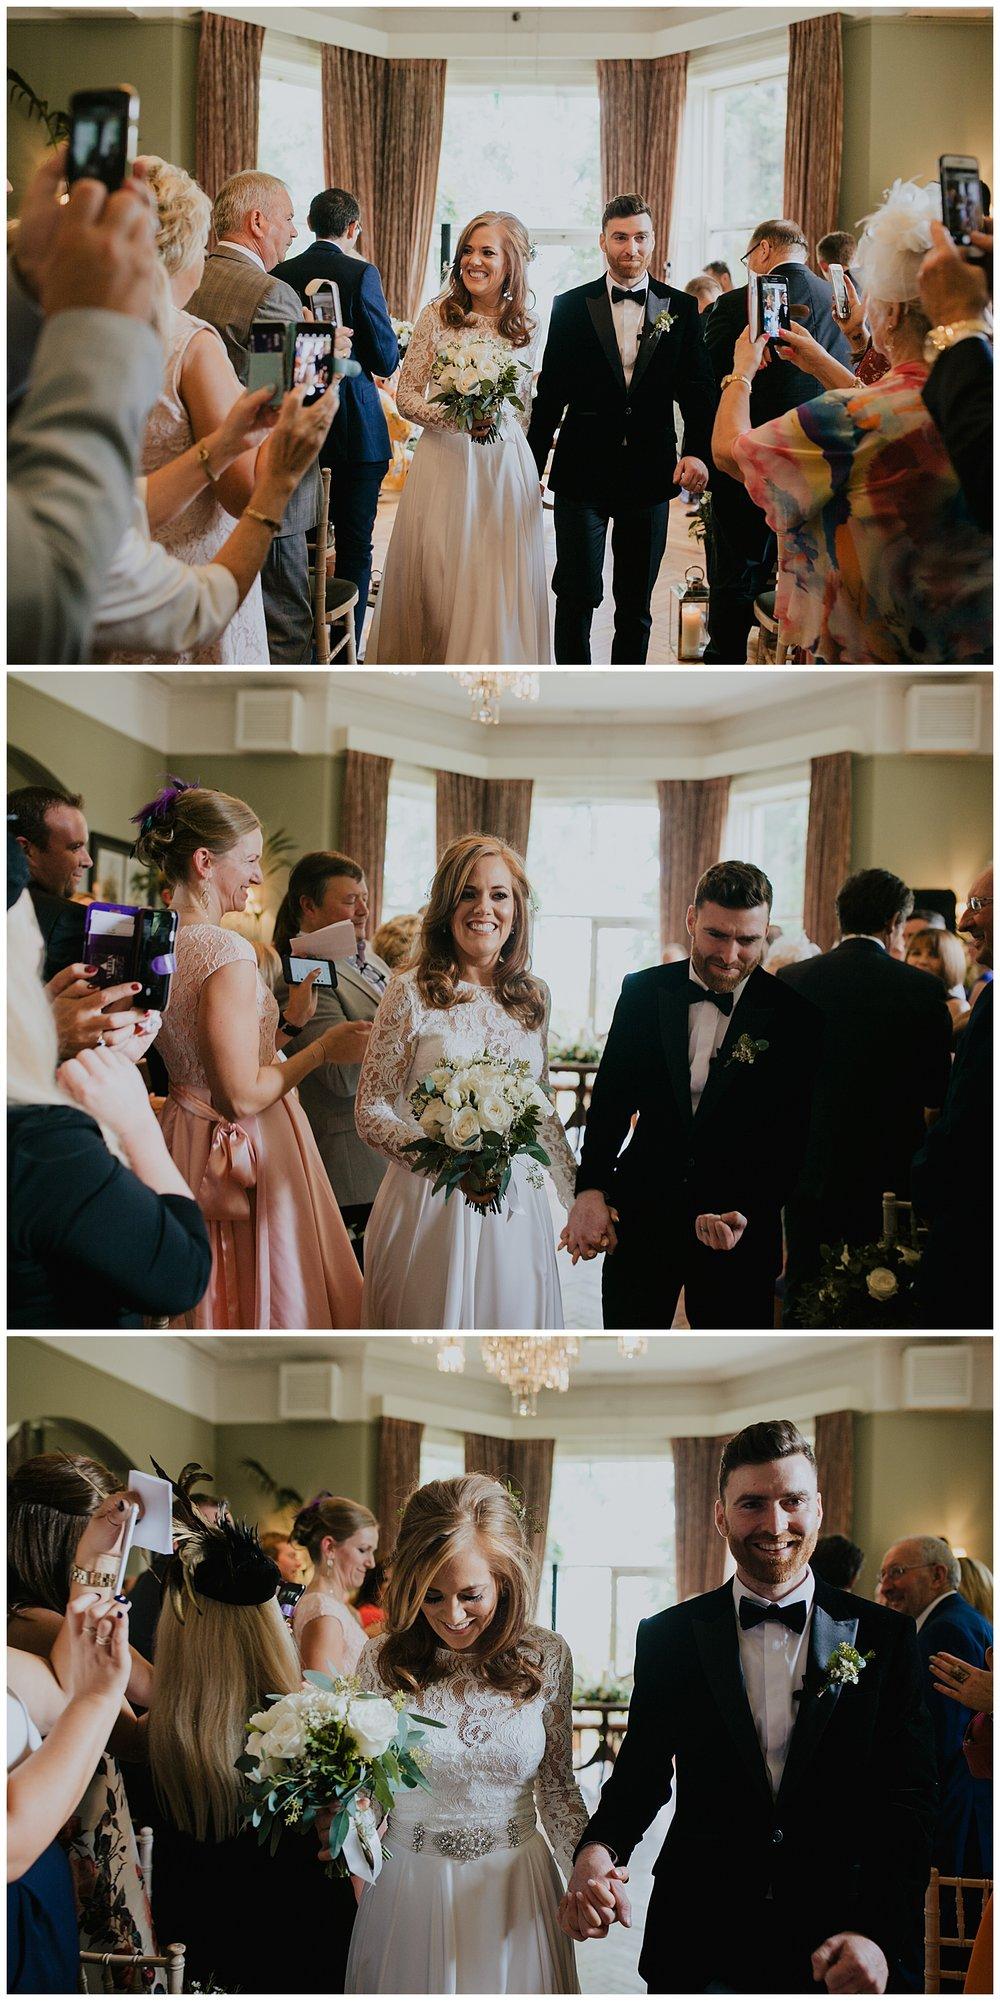 a&c_tinakilly_black_tie_wedding_photographer_livia_figueiredo_114.jpg